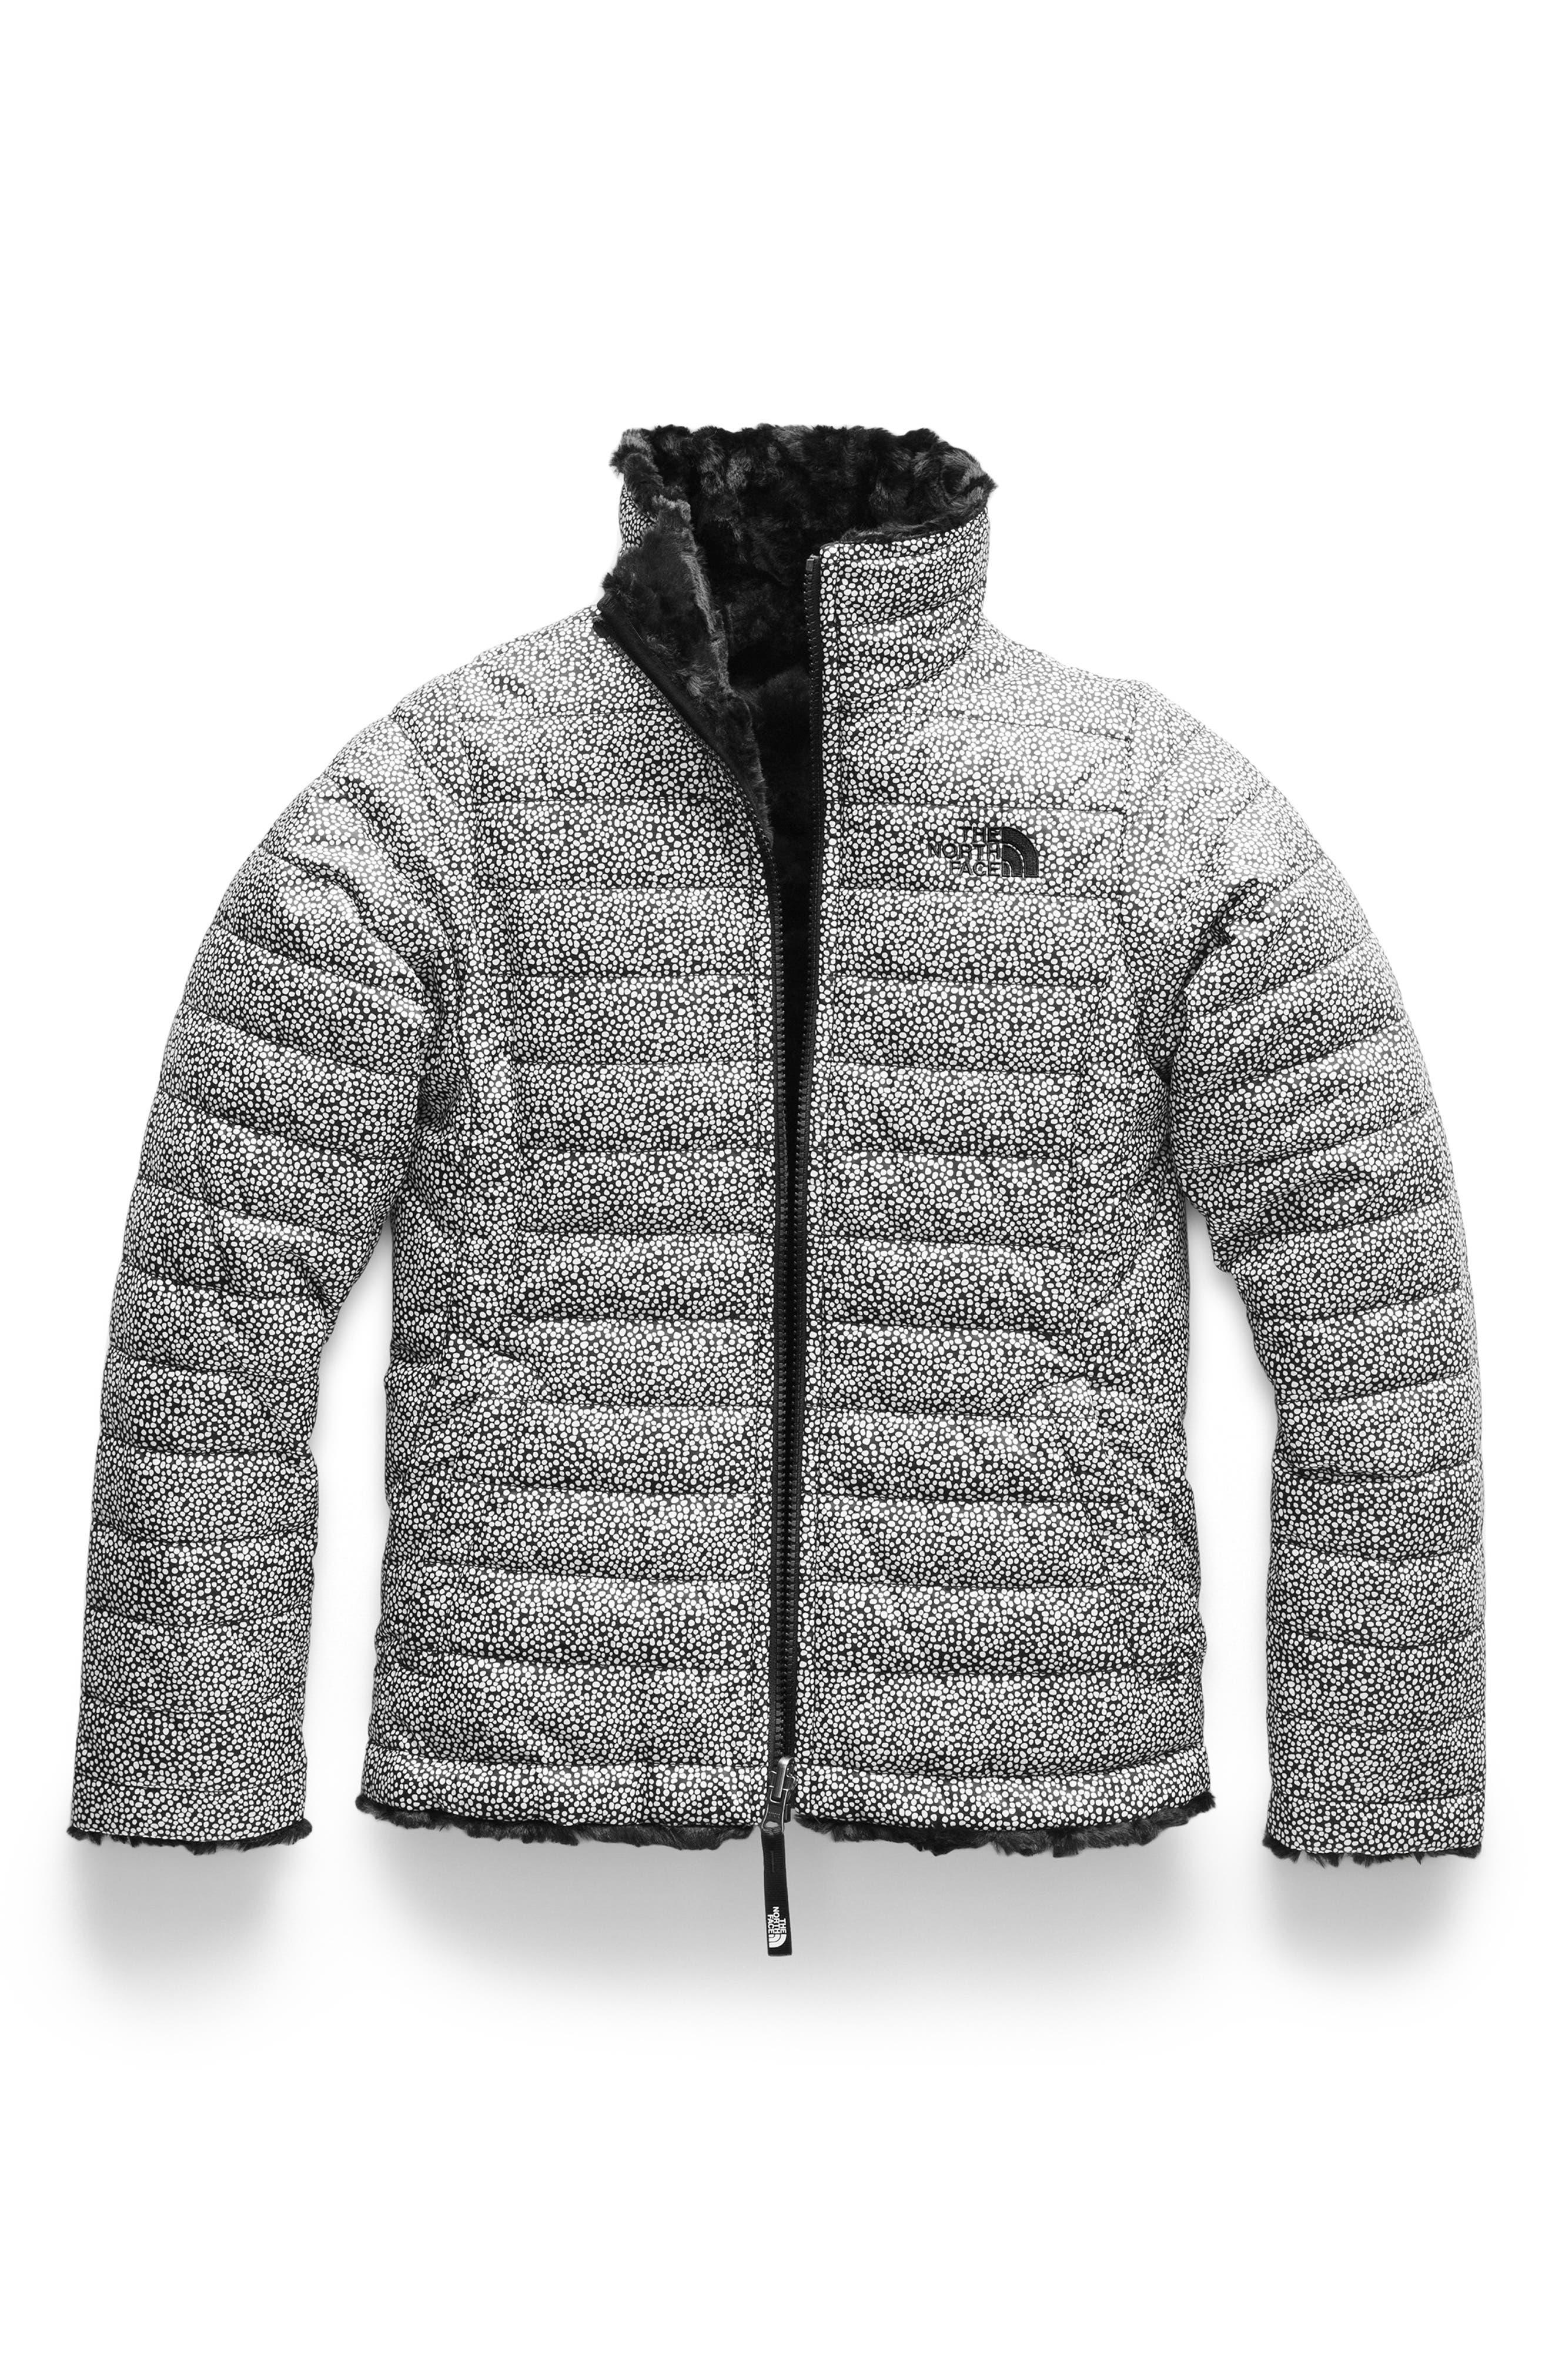 Mossbud Reversible Water Repellent Jacket,                         Main,                         color, TNF WHITE MINI DOT PRINT